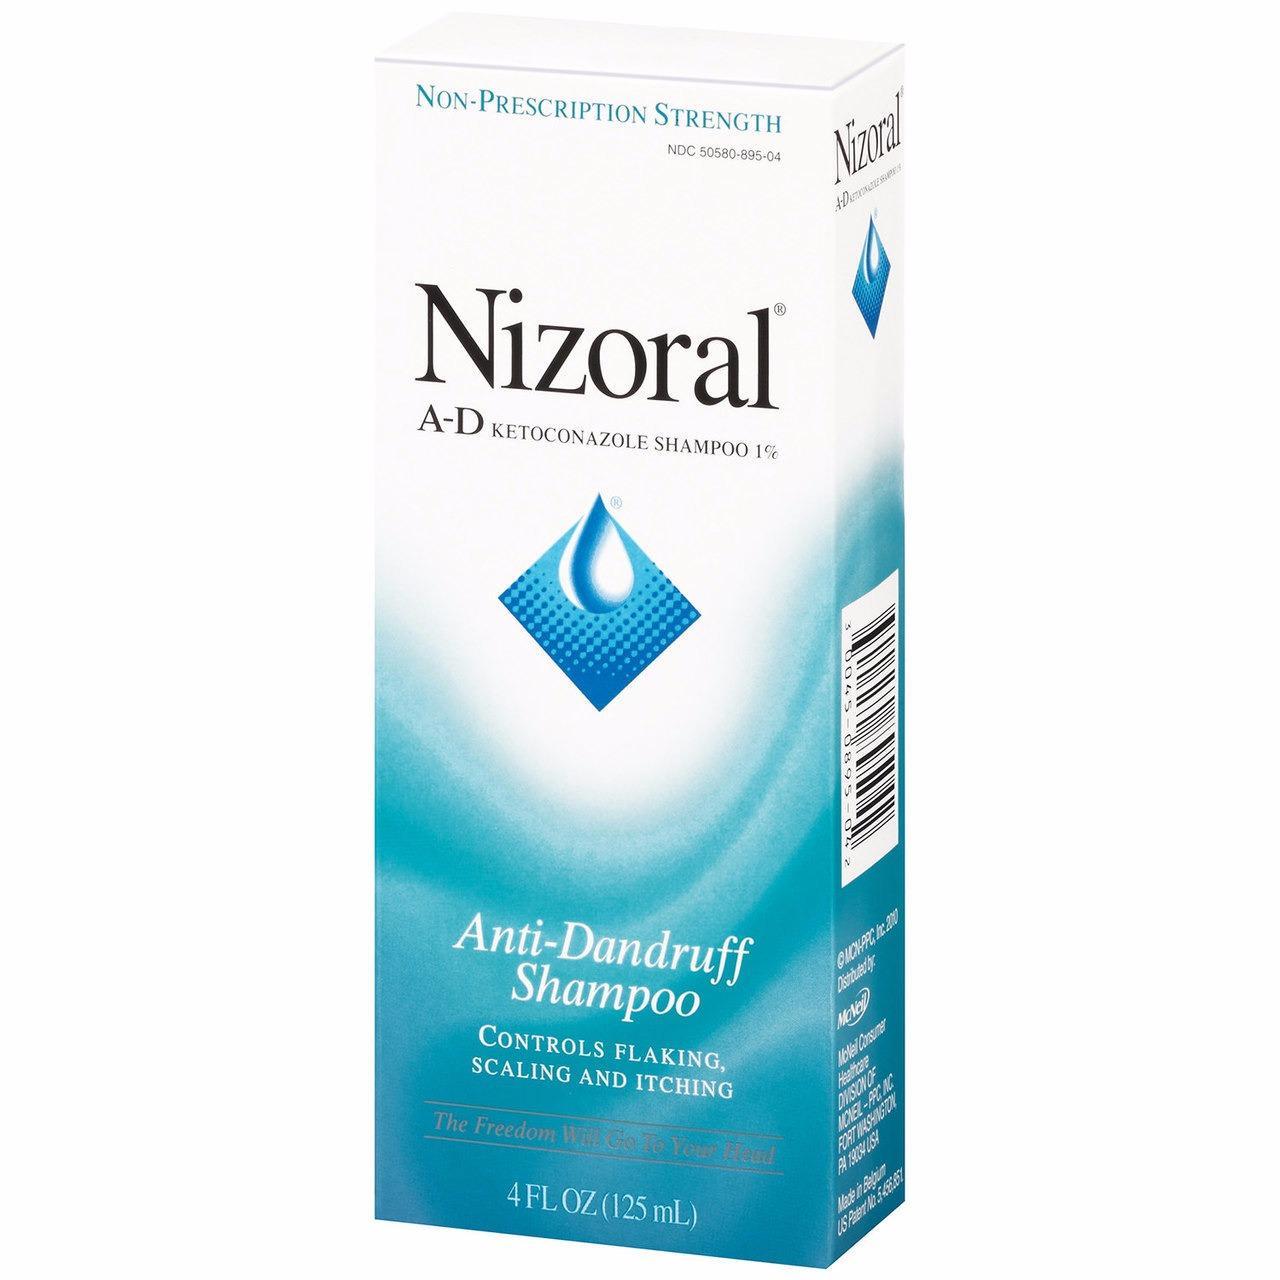 seasonably norethindrone as birth control